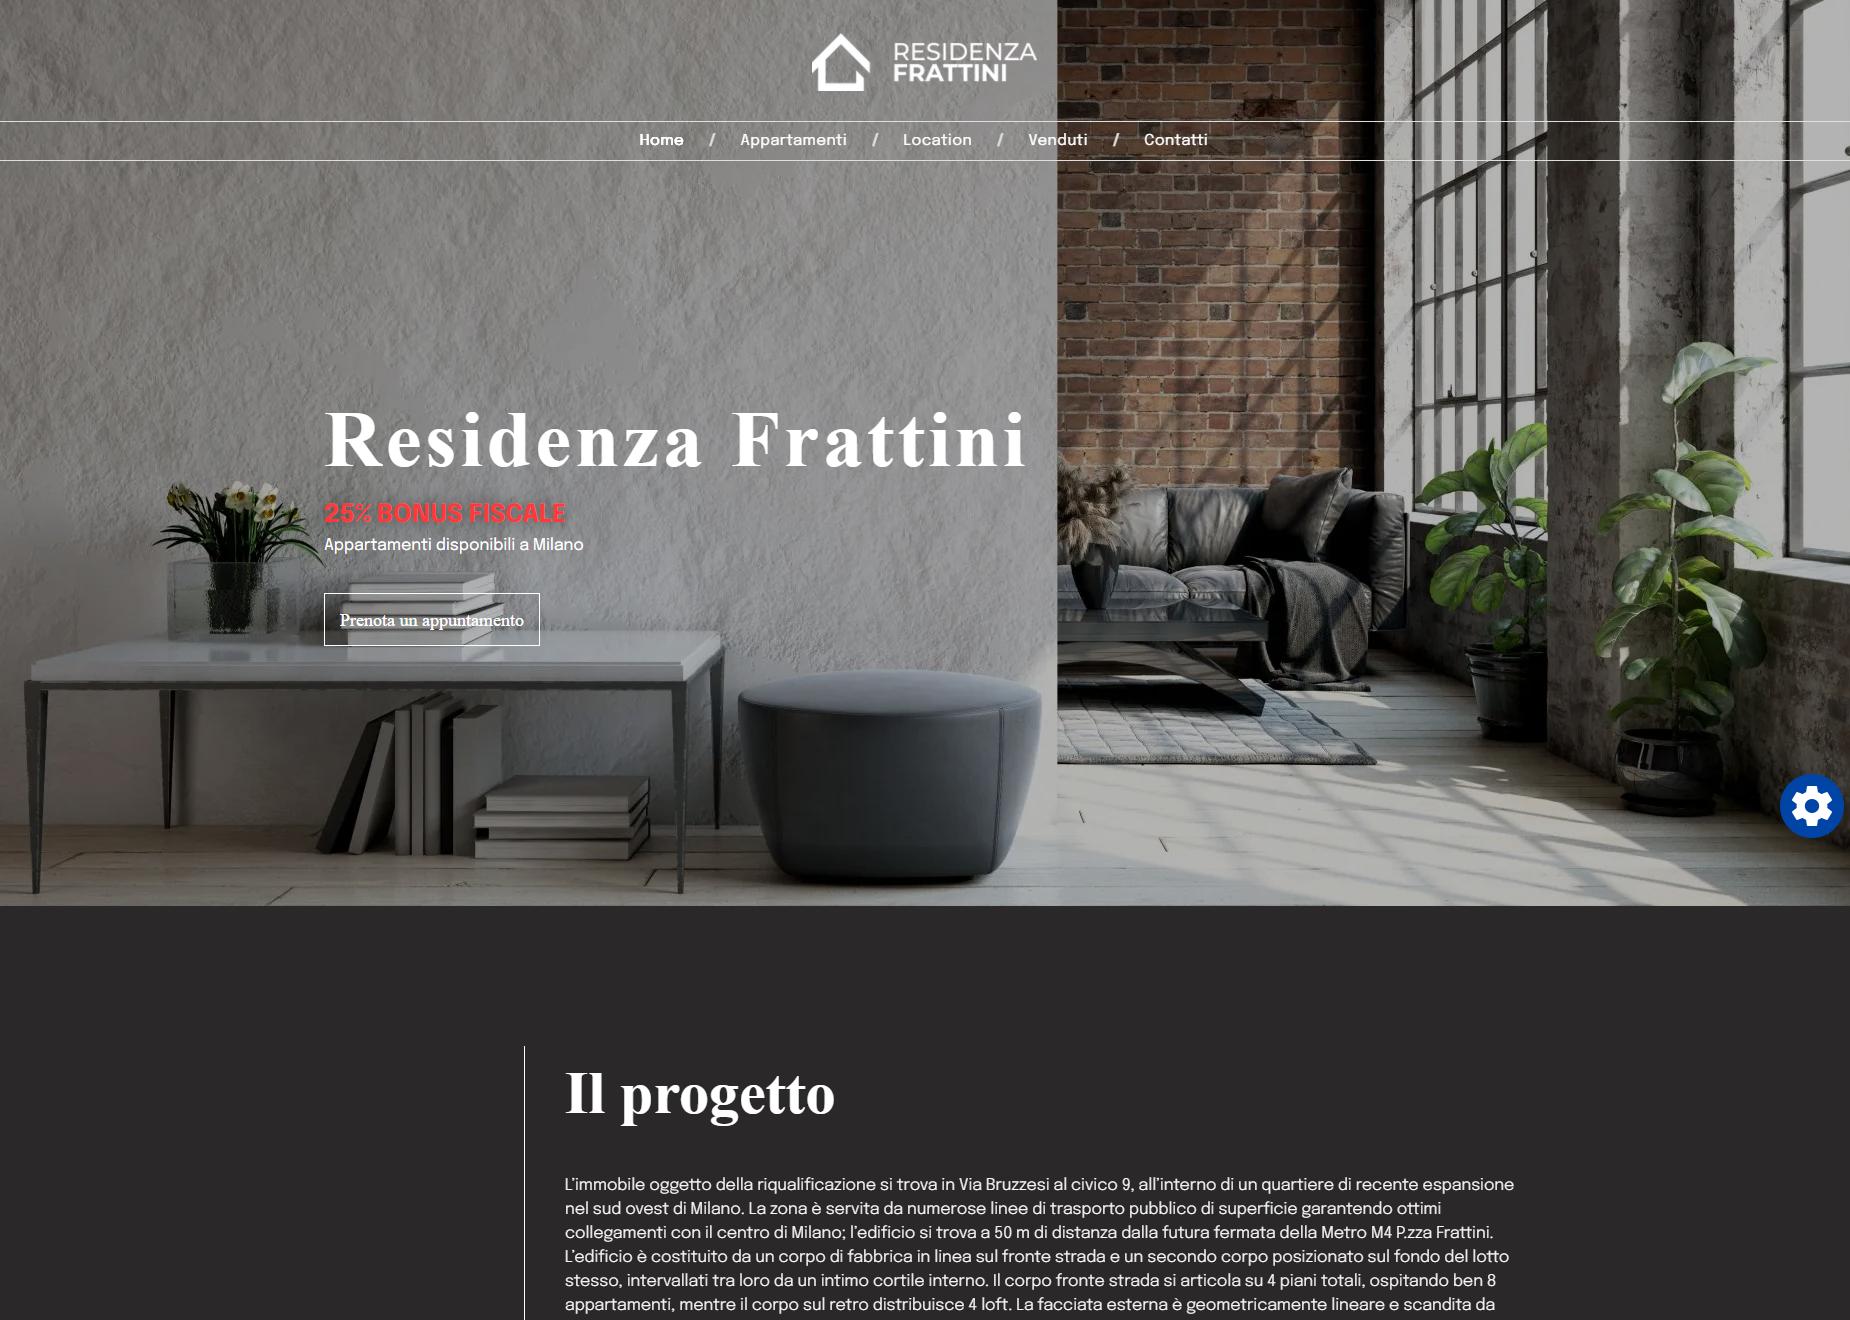 screencapture-residenzafrattini-it-2021-07-23-15_50_28 (2)